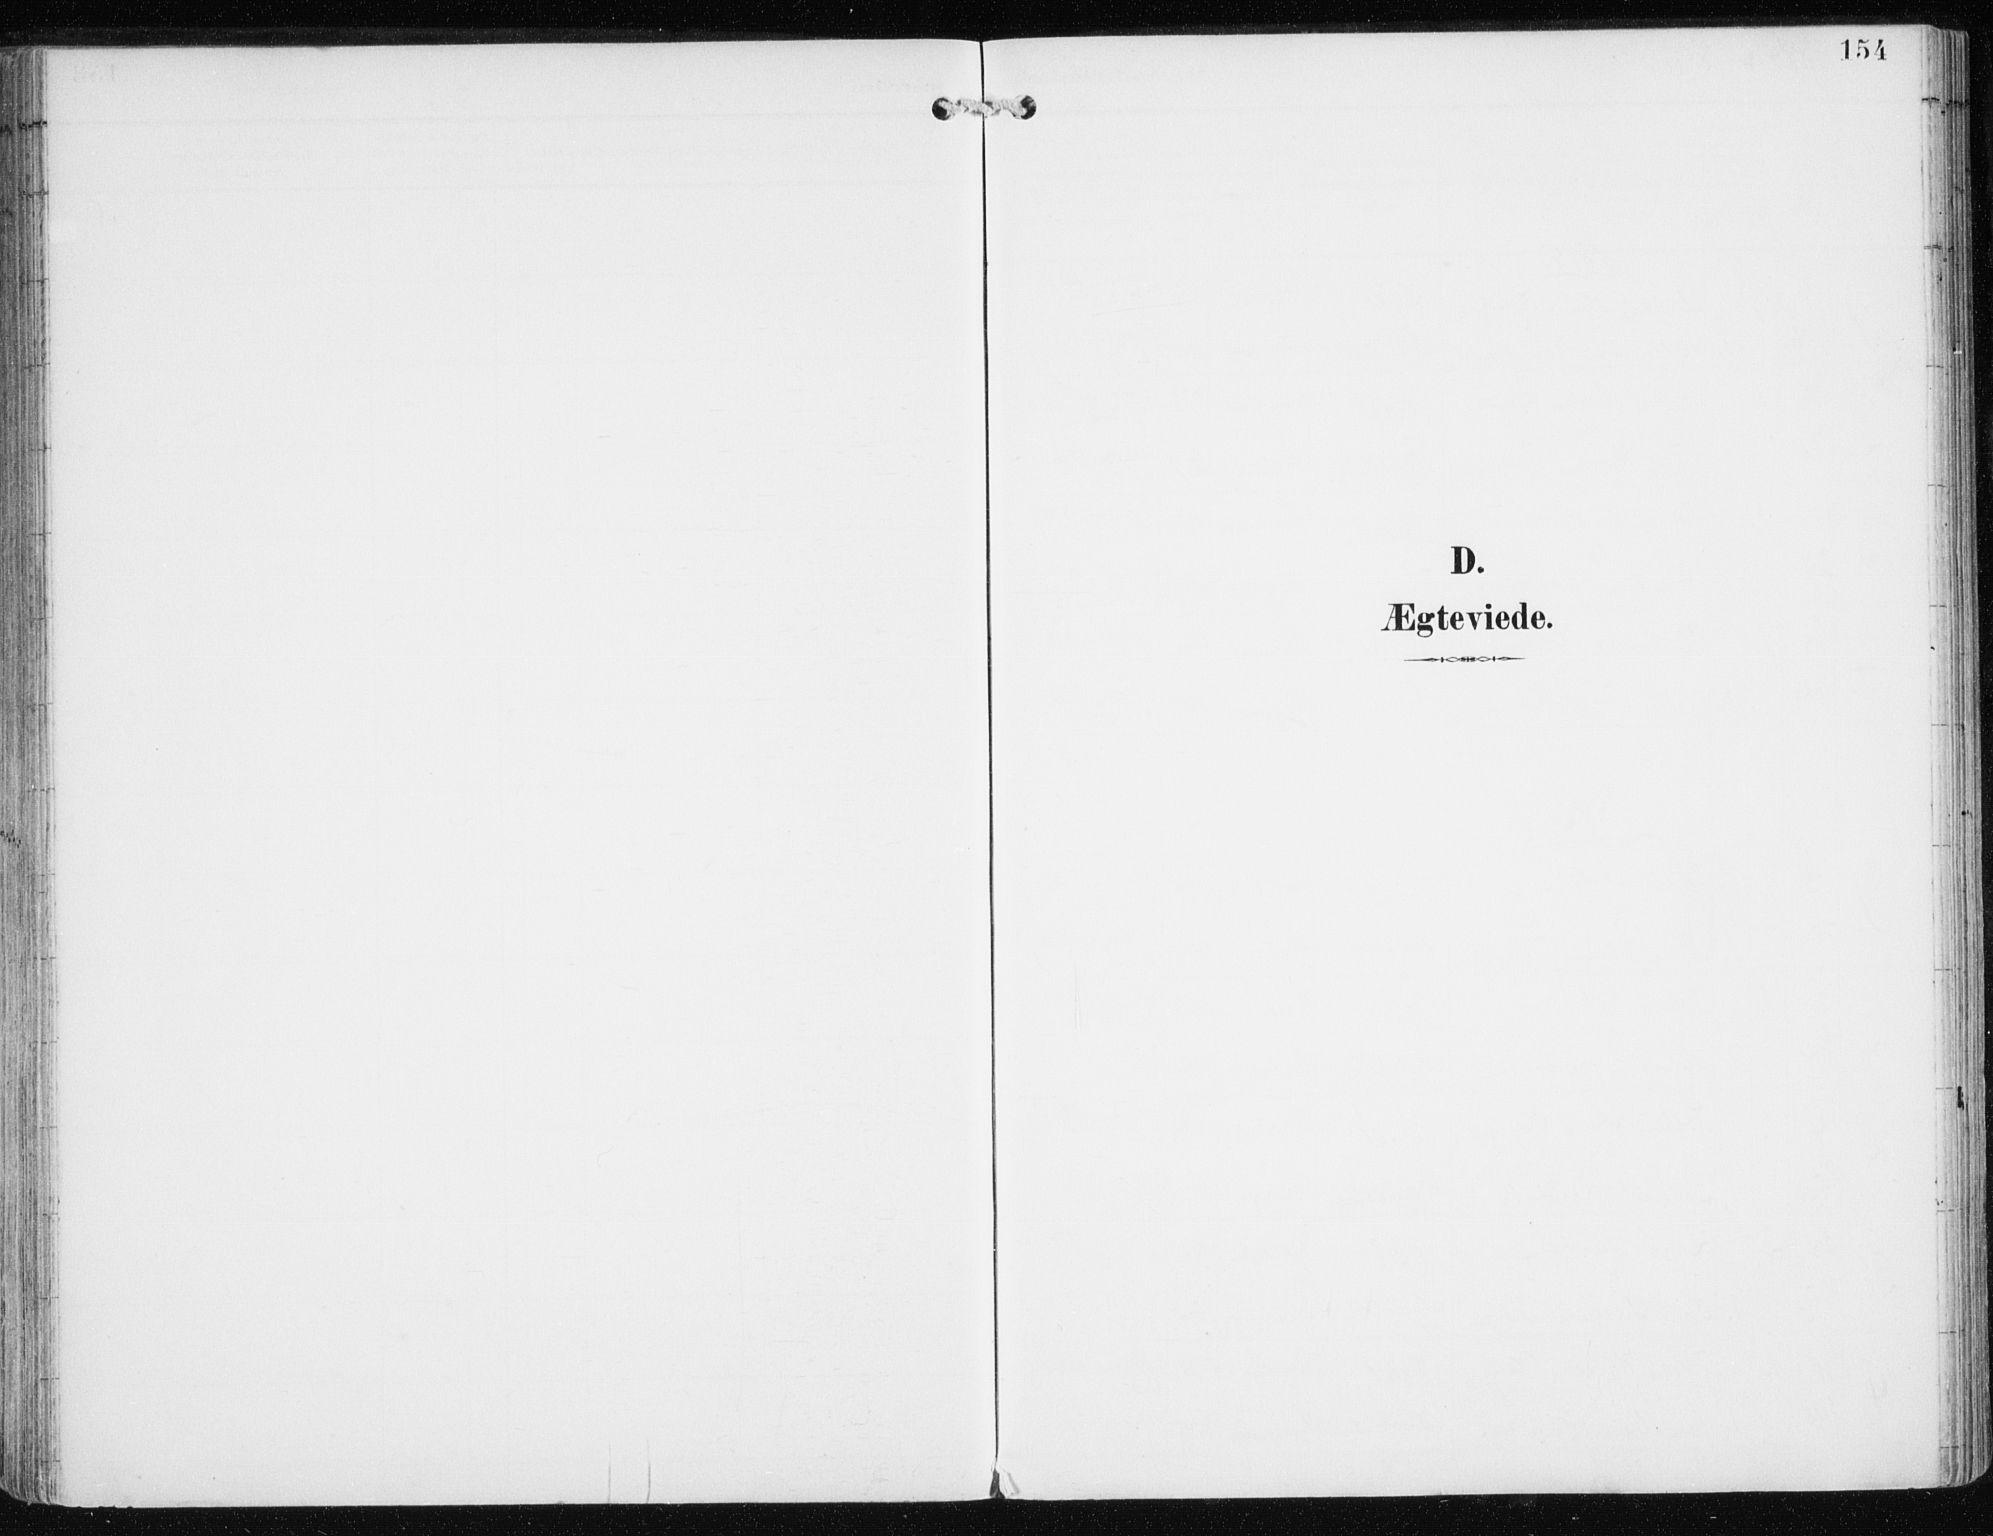 SATØ, Skjervøy sokneprestkontor, H/Ha/Haa/L0017kirke: Ministerialbok nr. 17, 1895-1911, s. 154